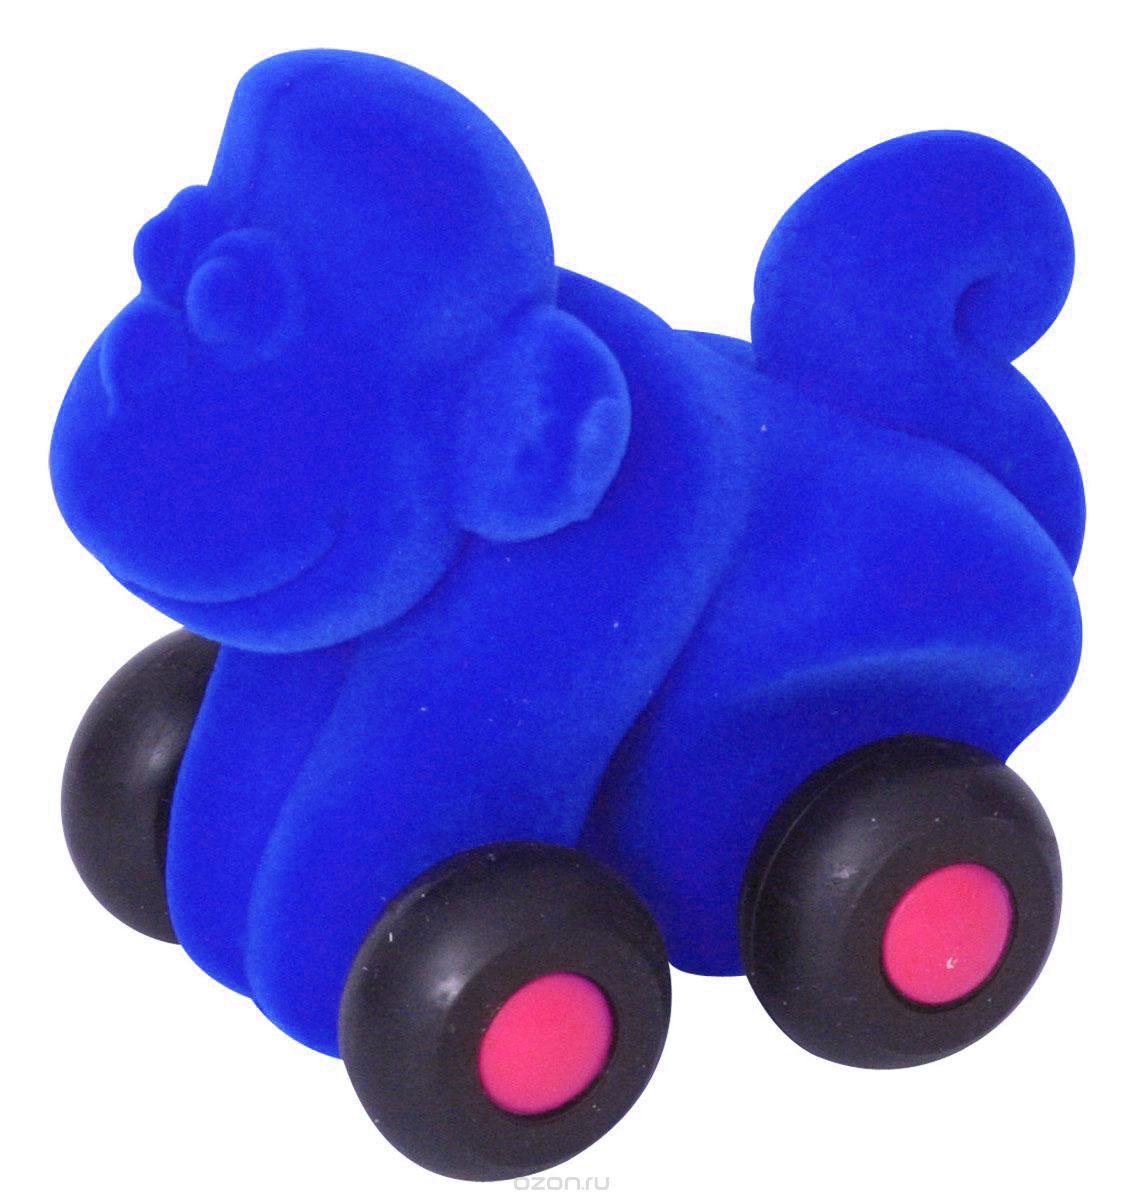 Rubbabu Фигурка функциональная Обезьяна цвет синий rubbabu фигурка функциональная обезьяна цвет синий